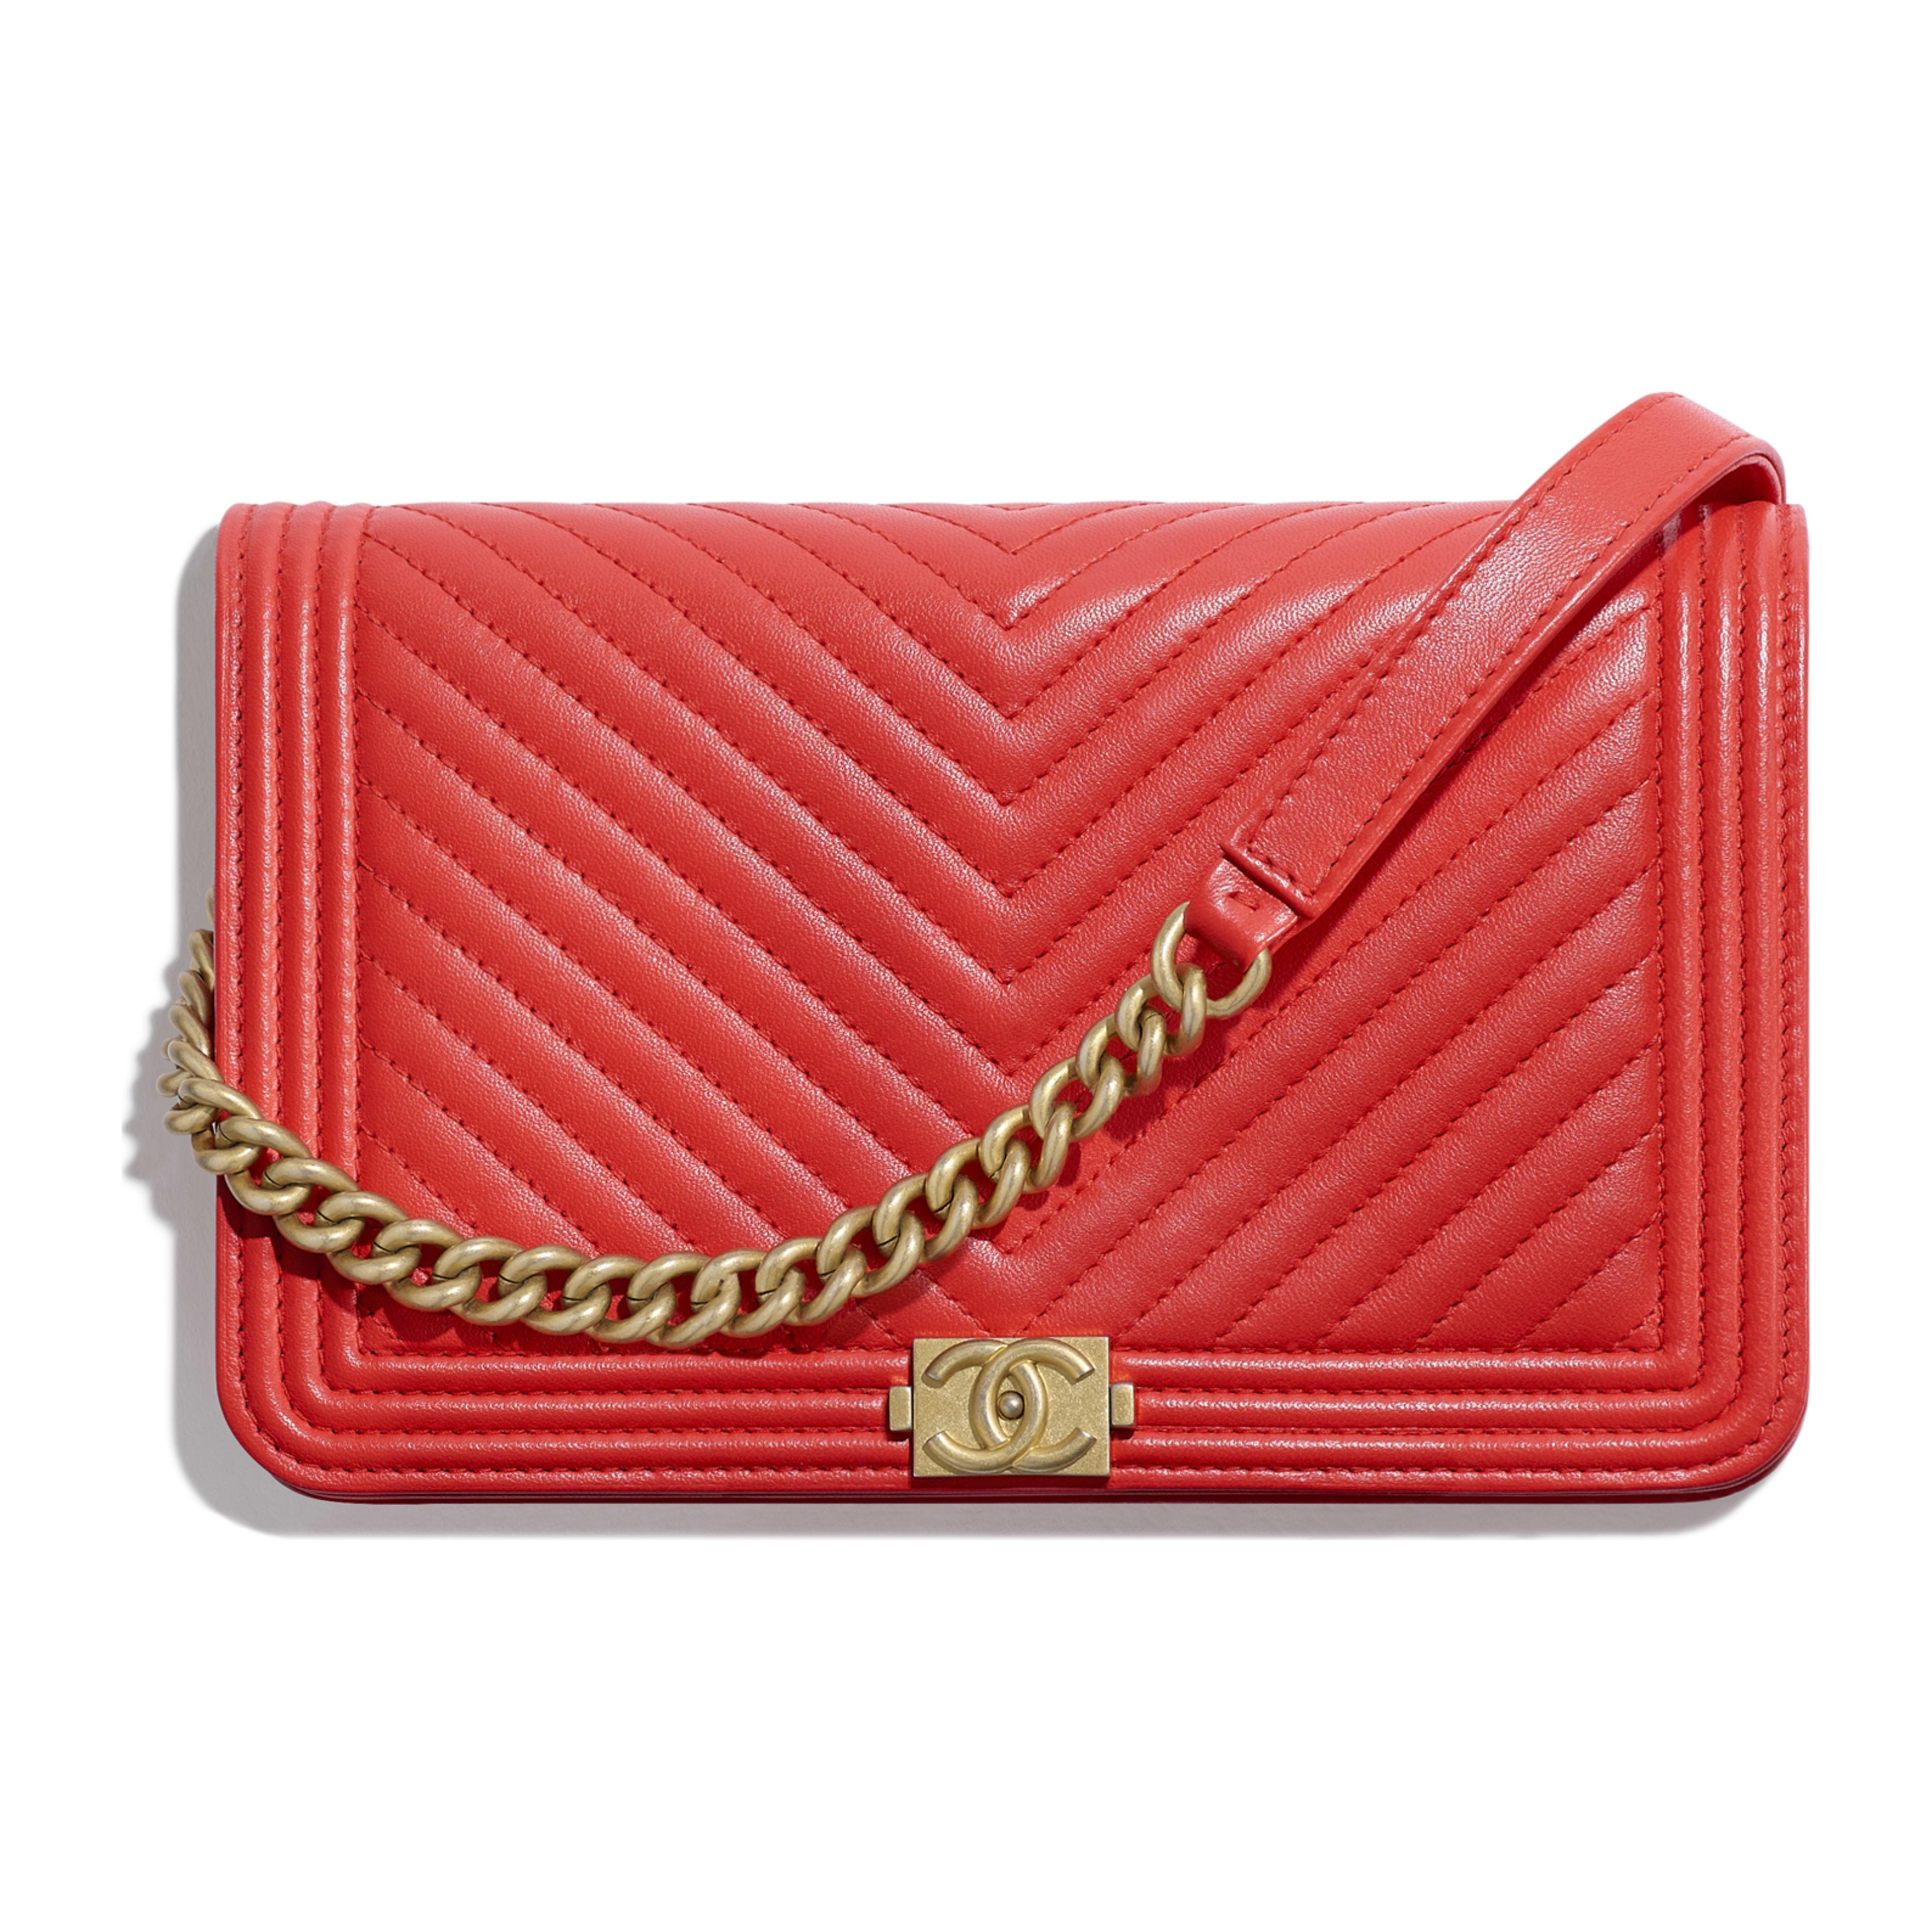 167e72acf7f9 Lambskin   Gold-Tone Metal Red BOY CHANEL Wallet on Chain